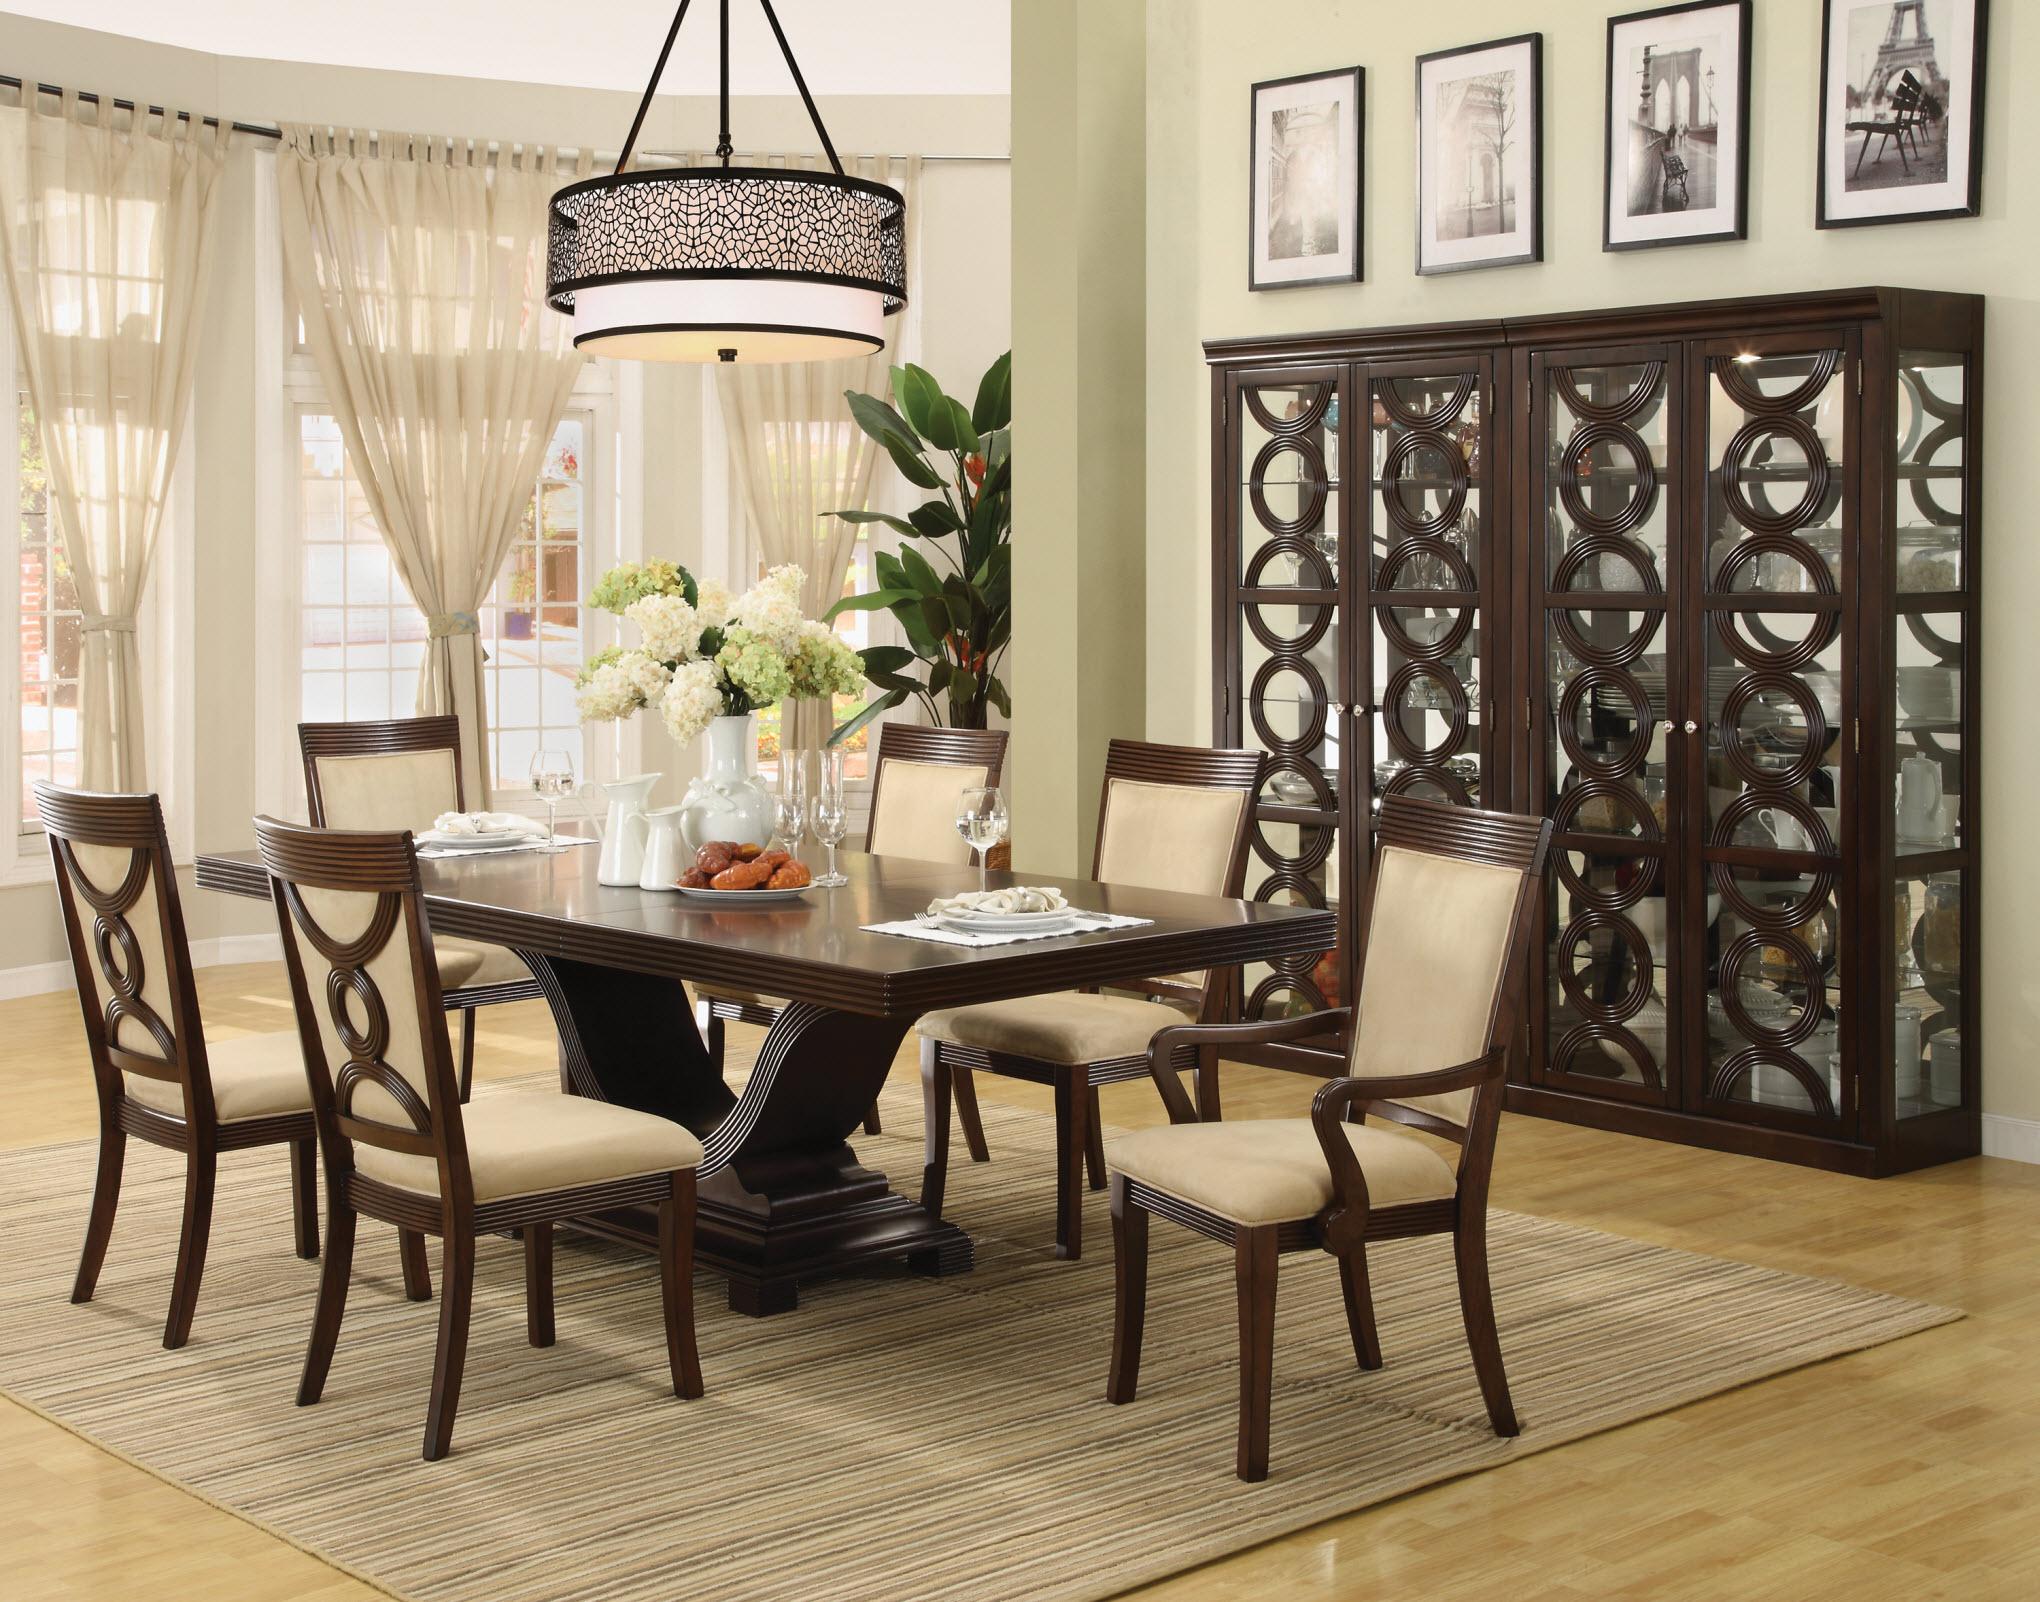 Dining-Room-Sets s